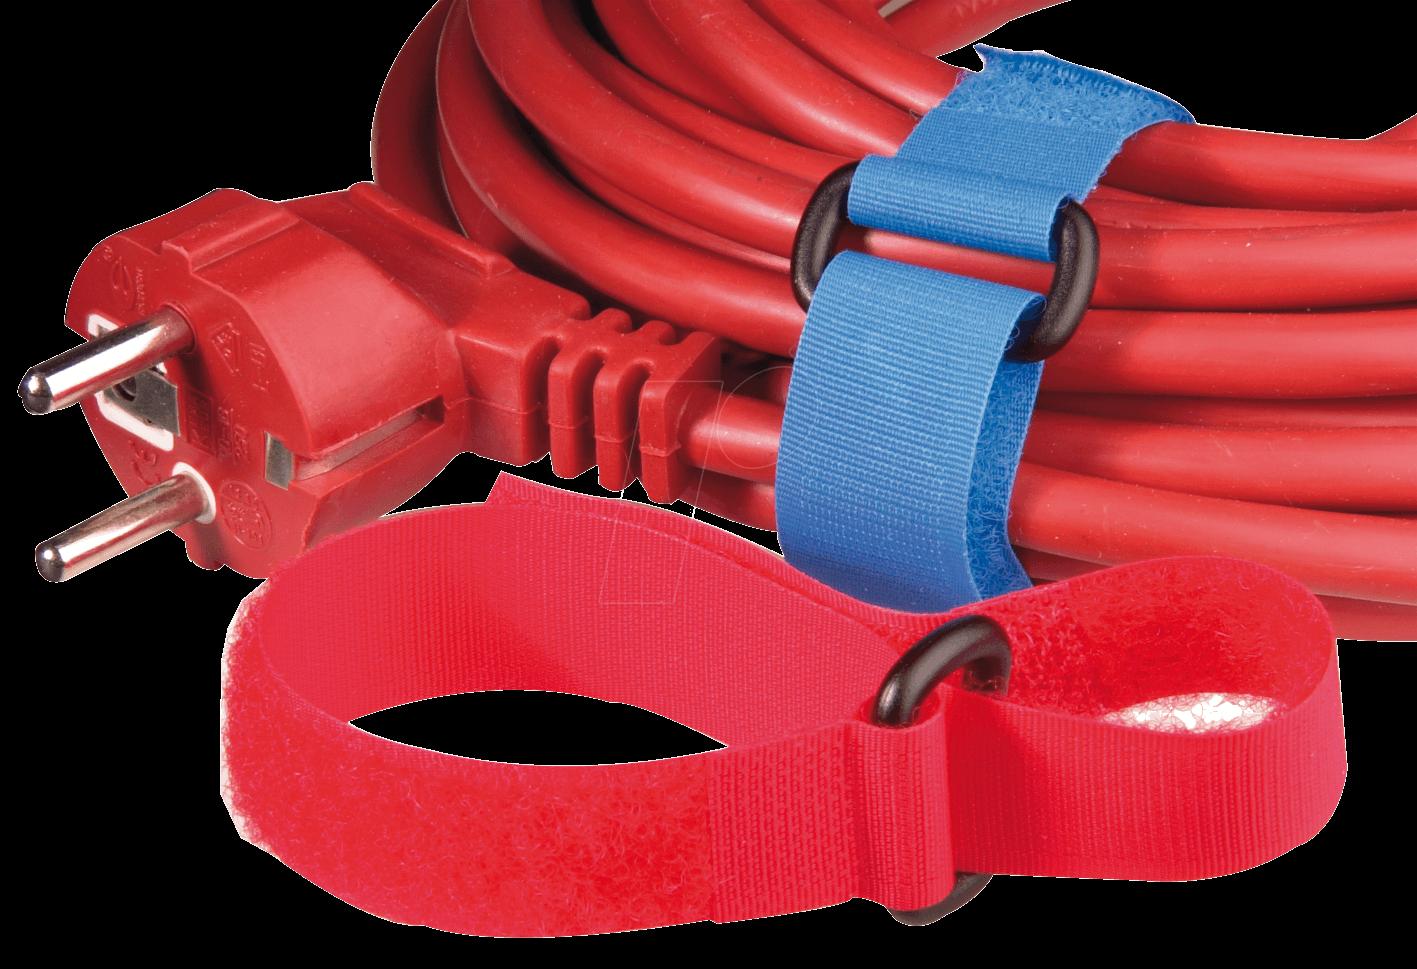 KLETTBAND 300 BL - Klettband mit Schlinge, 300 x 20 mm, blau